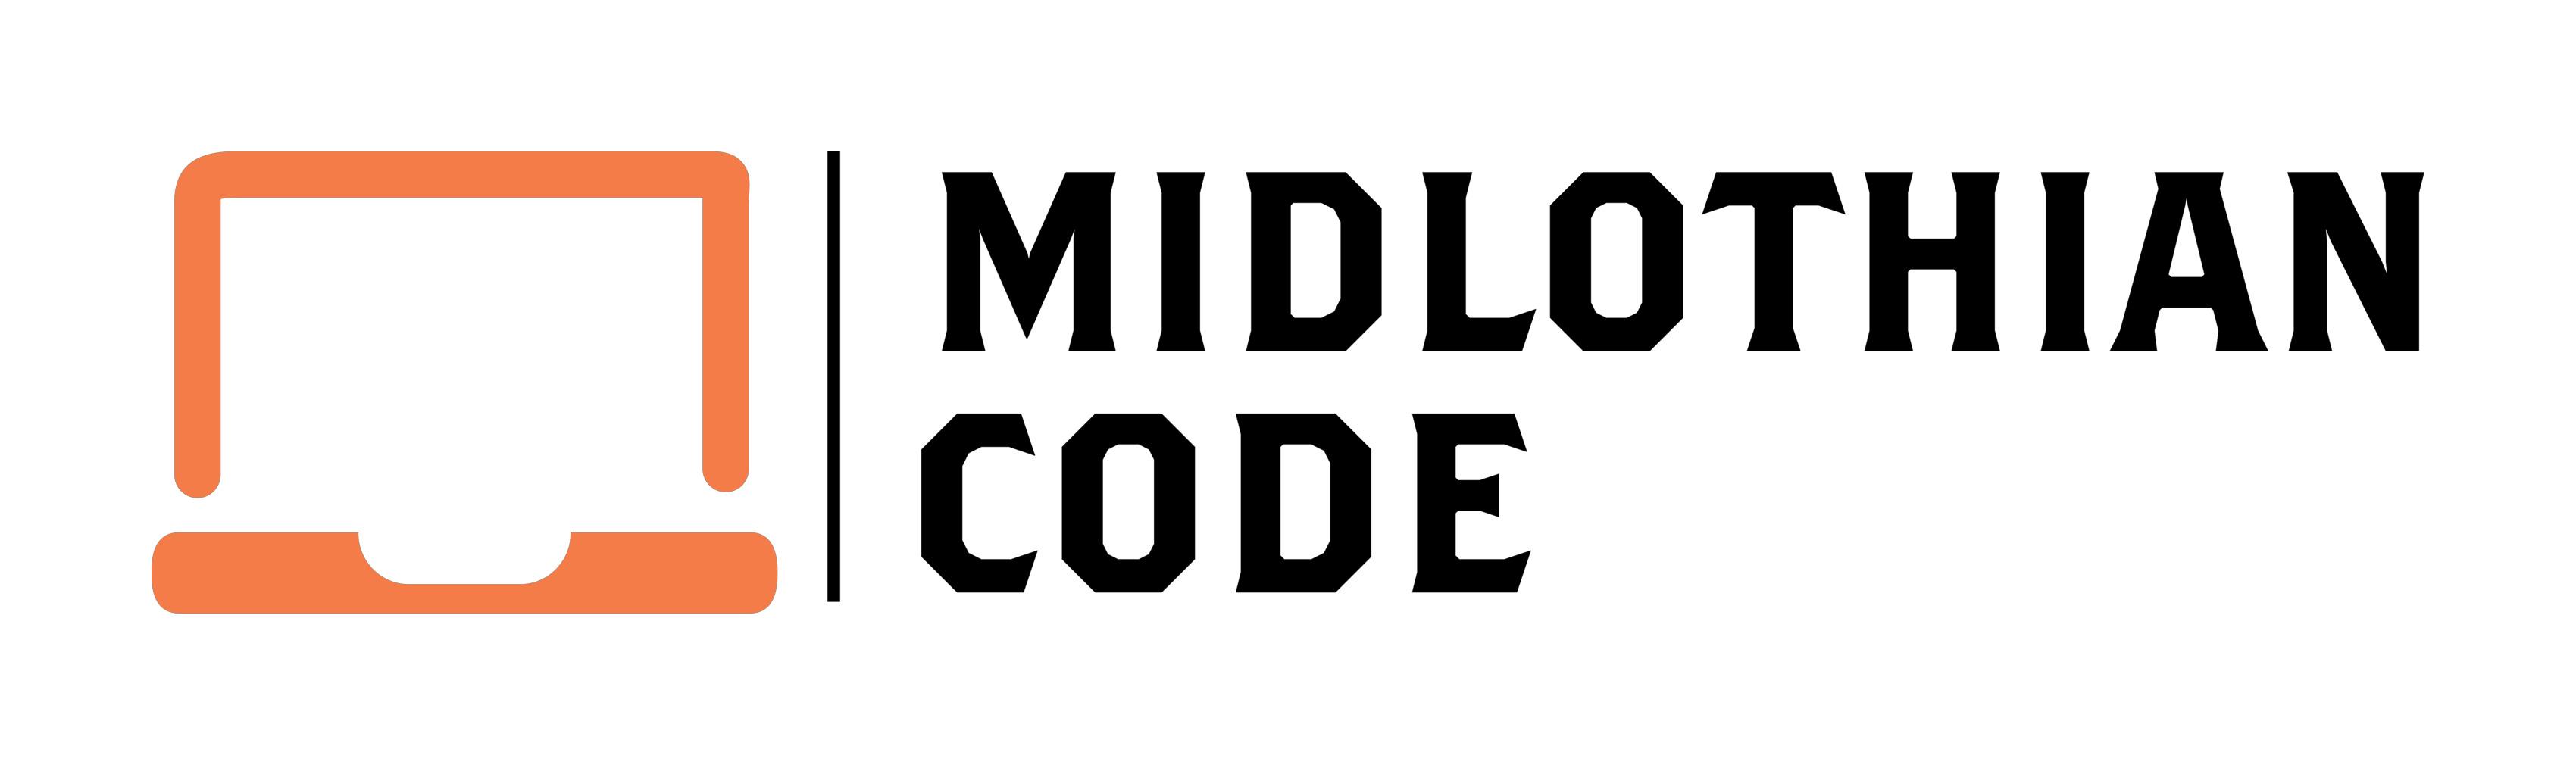 Midlothian Code Logo